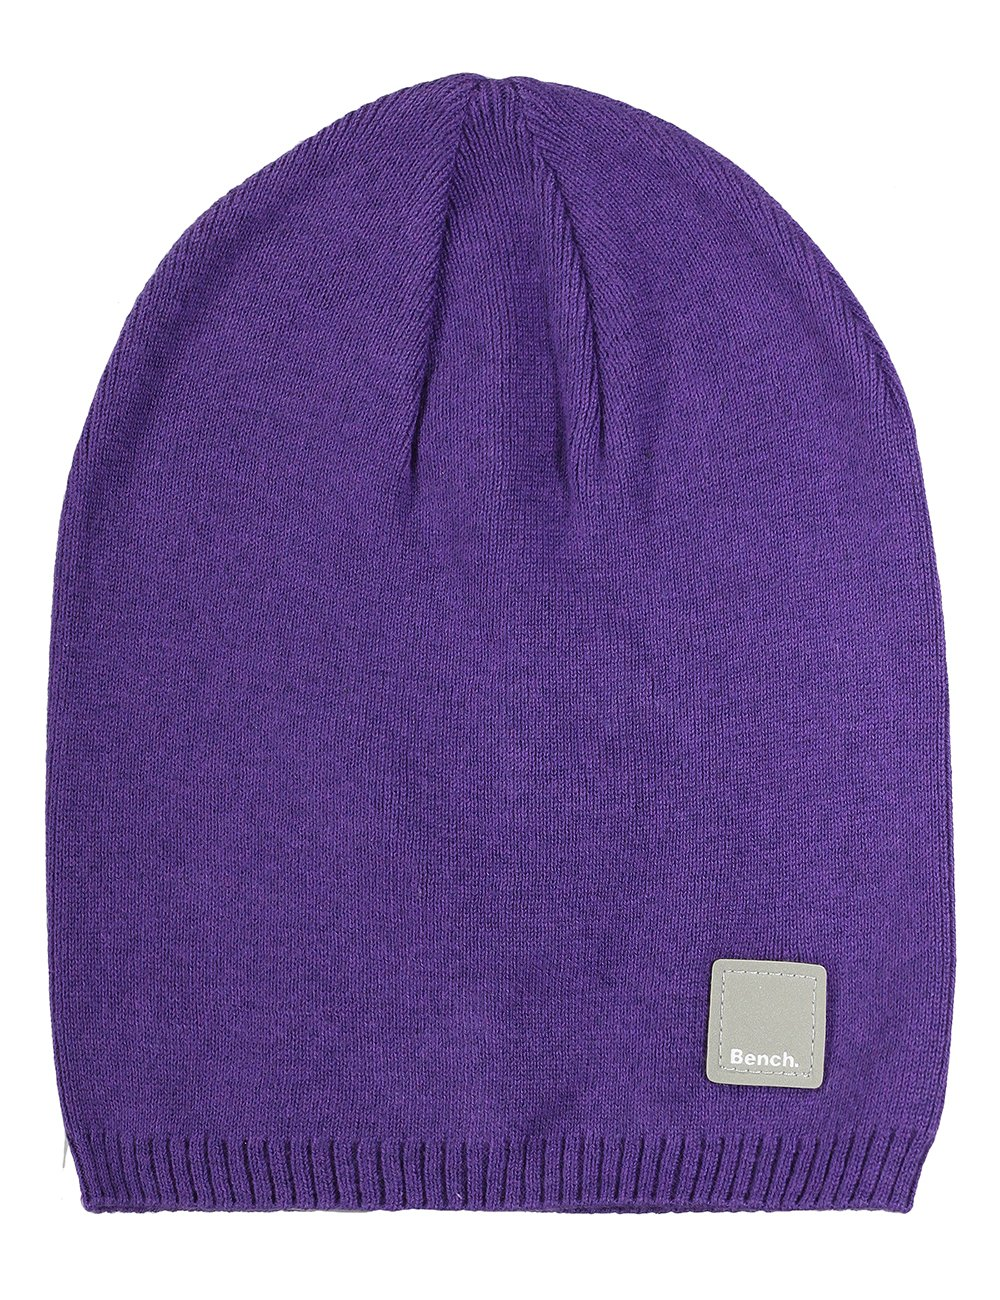 Bench Mallik-B Men's Knitted Hat One Size Pale Grey Marl, BMWA0553B BLWA0382B